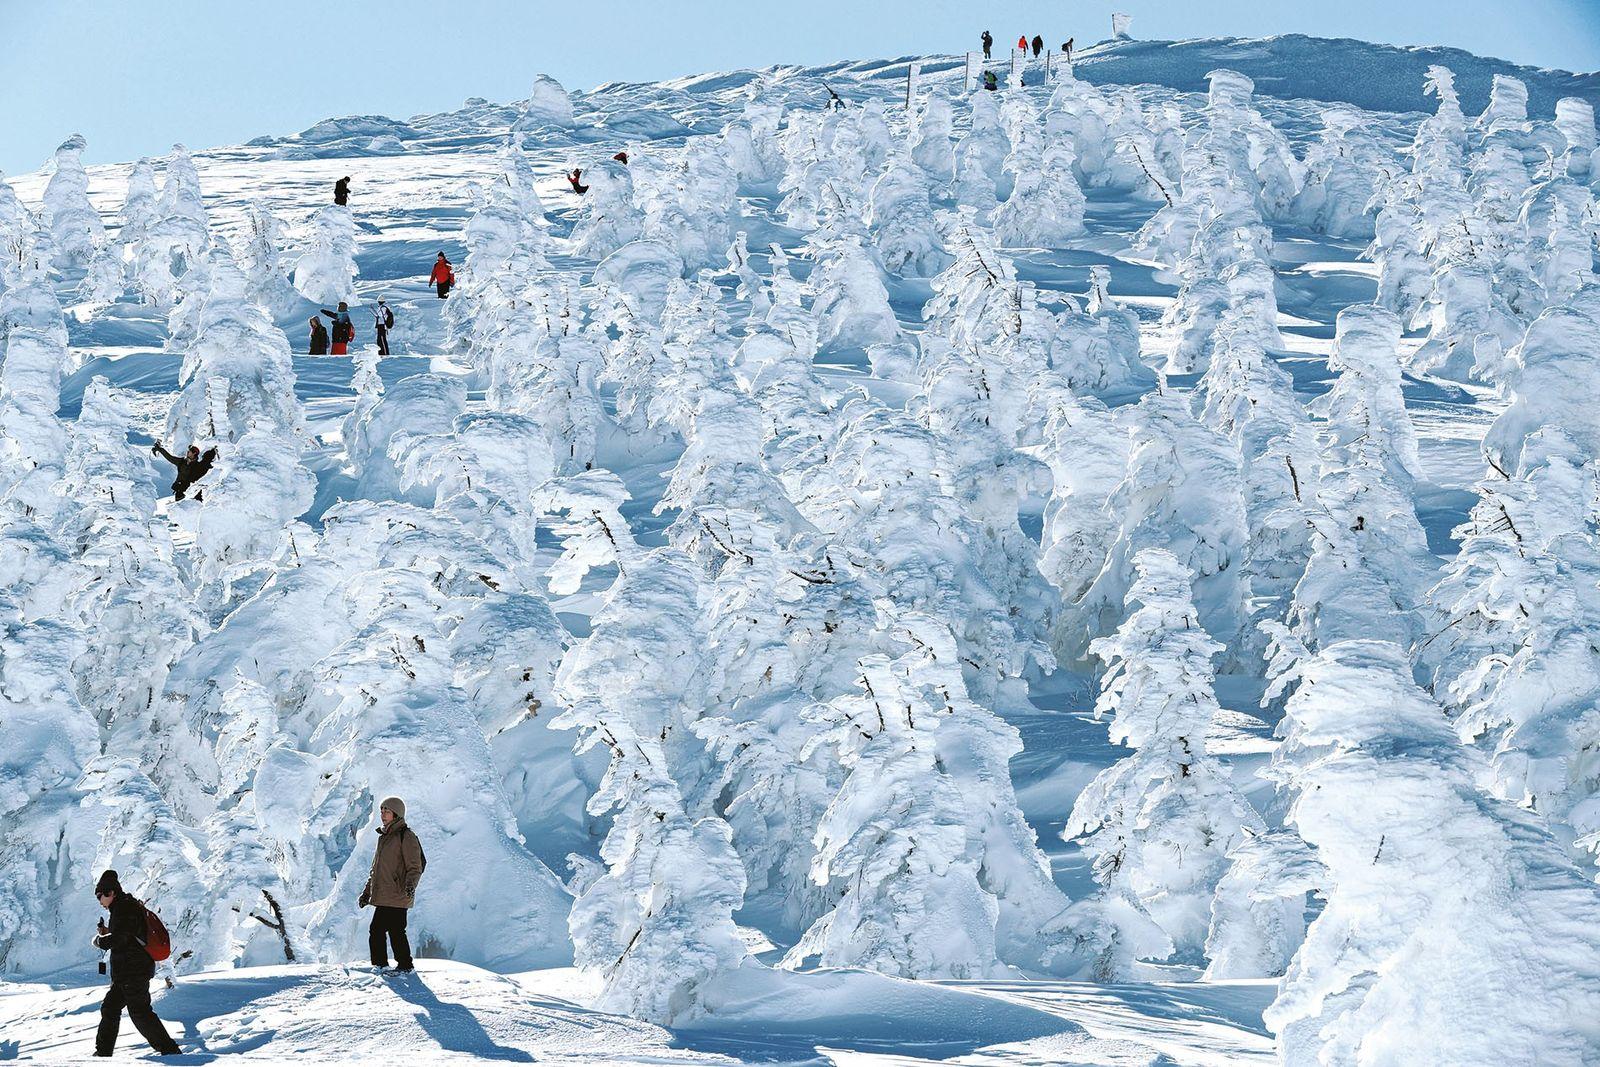 Tokohu's Zao ski resort